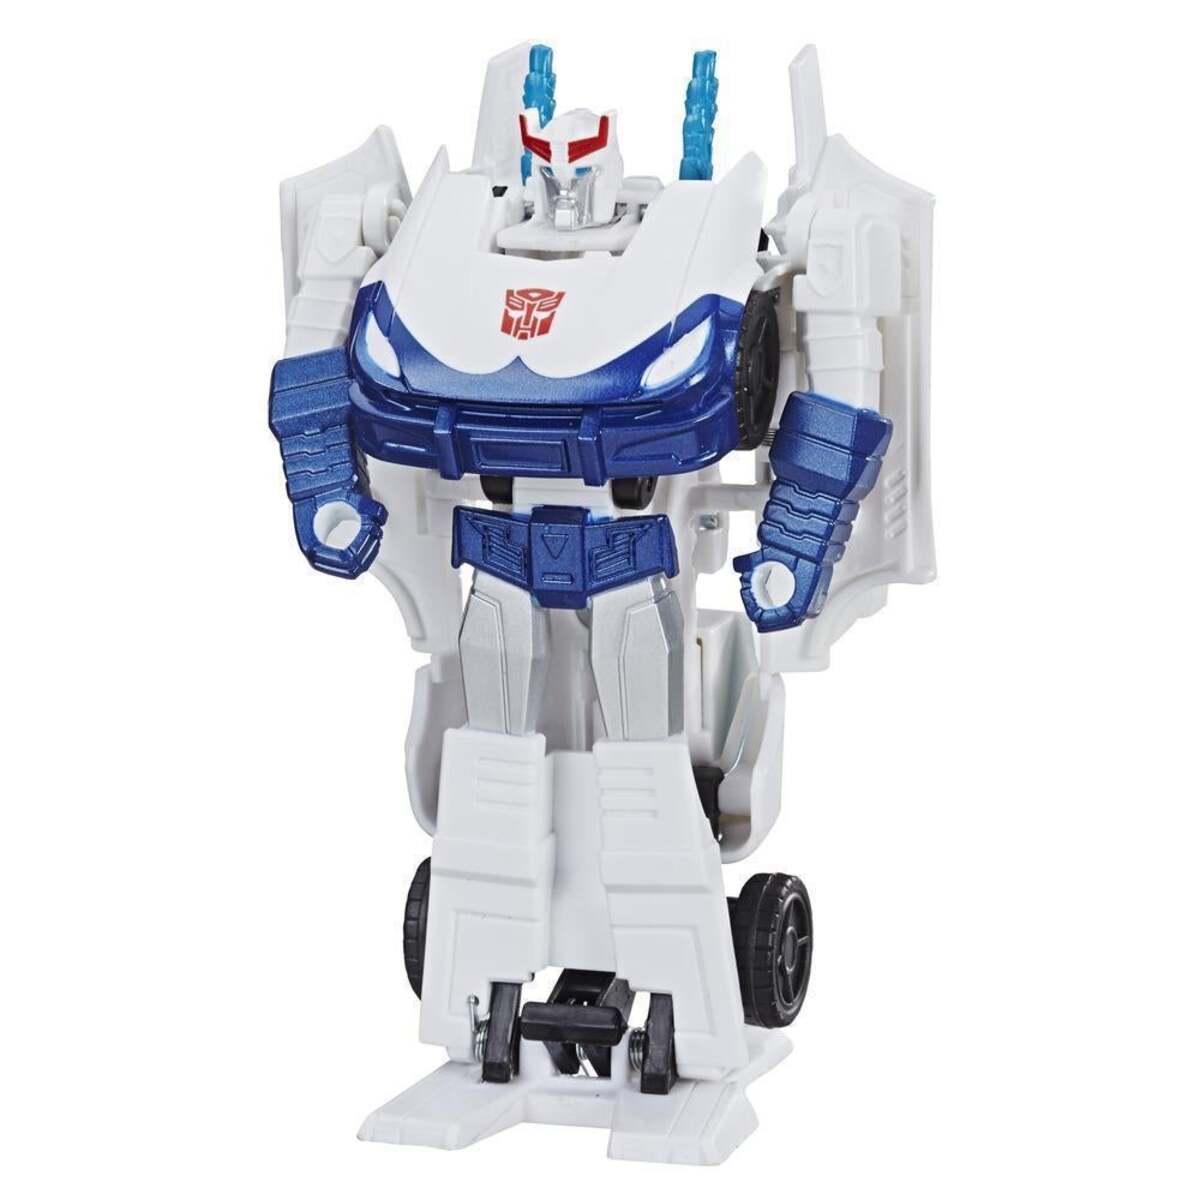 Bild 3 von Hasbro Transformers Cyberverse Action Attackers: 1-Step